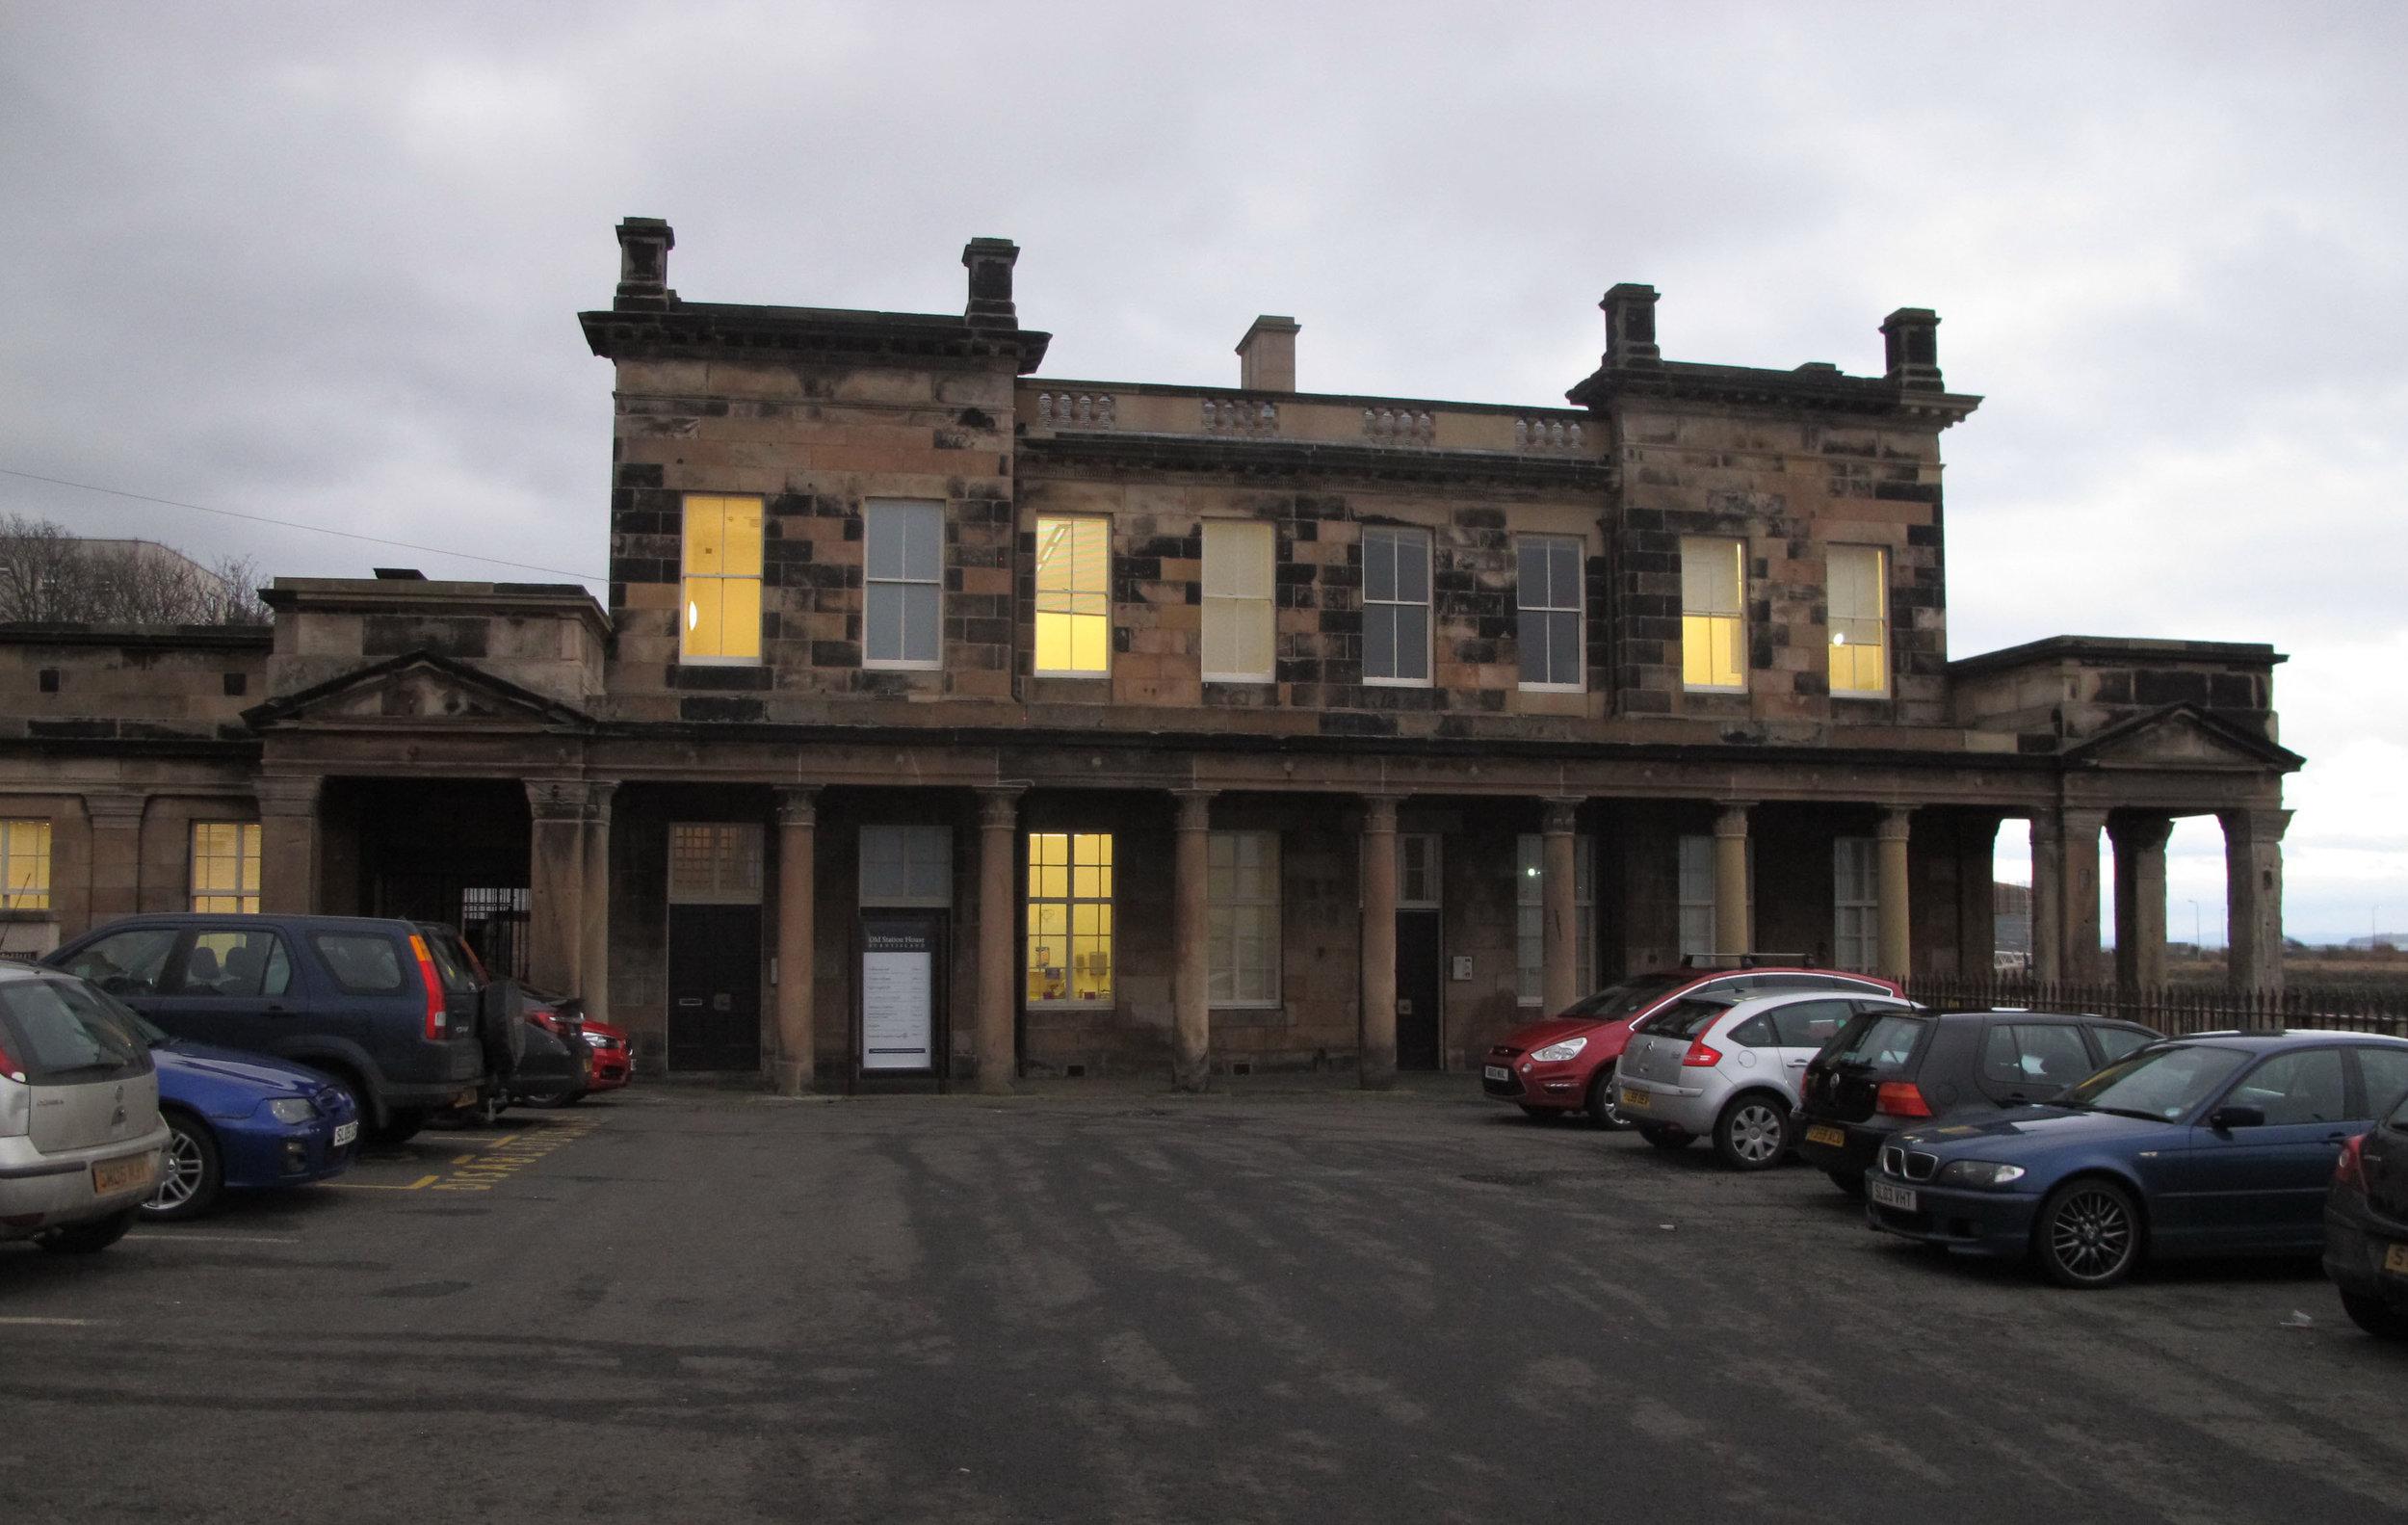 dark-imageBurntisland-Station-House.jpg